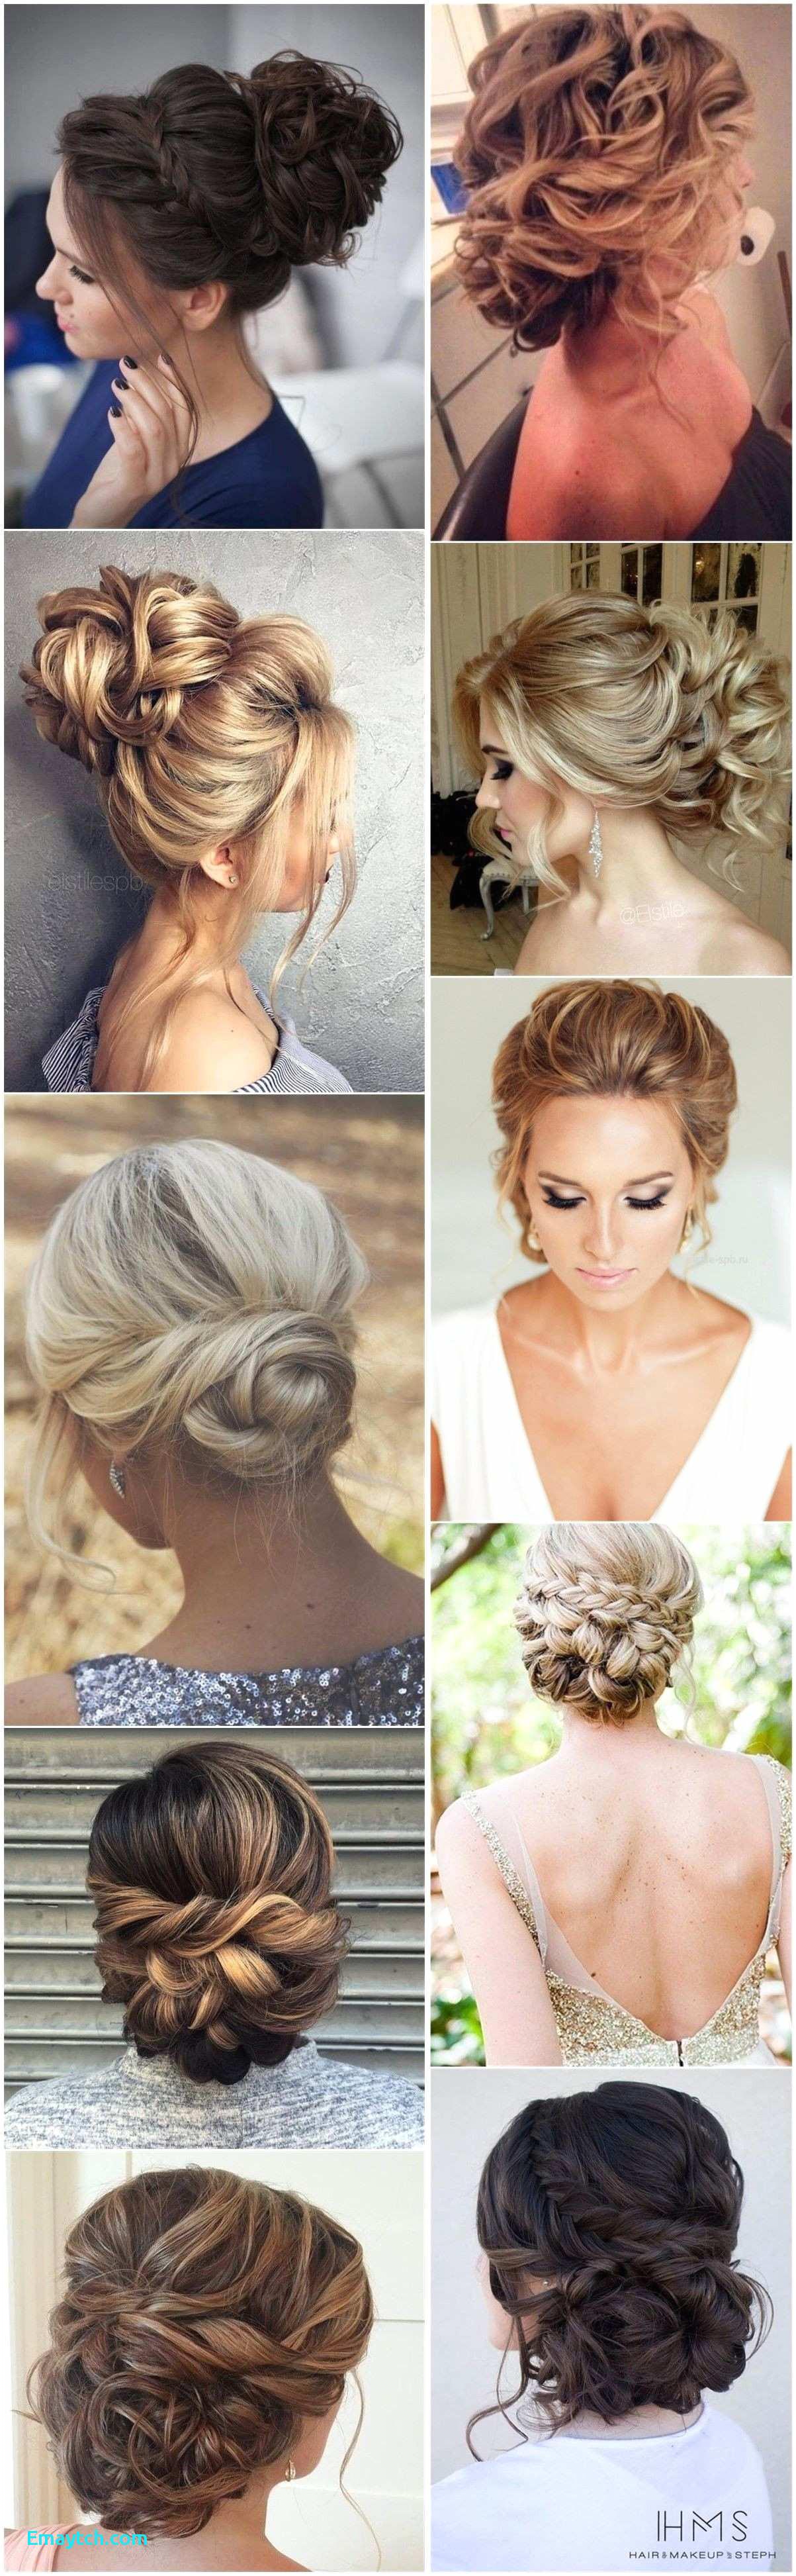 Hair In Style Good Long Hair Style Elegant I Pinimg 1200x 0d 60 8a 0d608a58a4bb3ed3b A